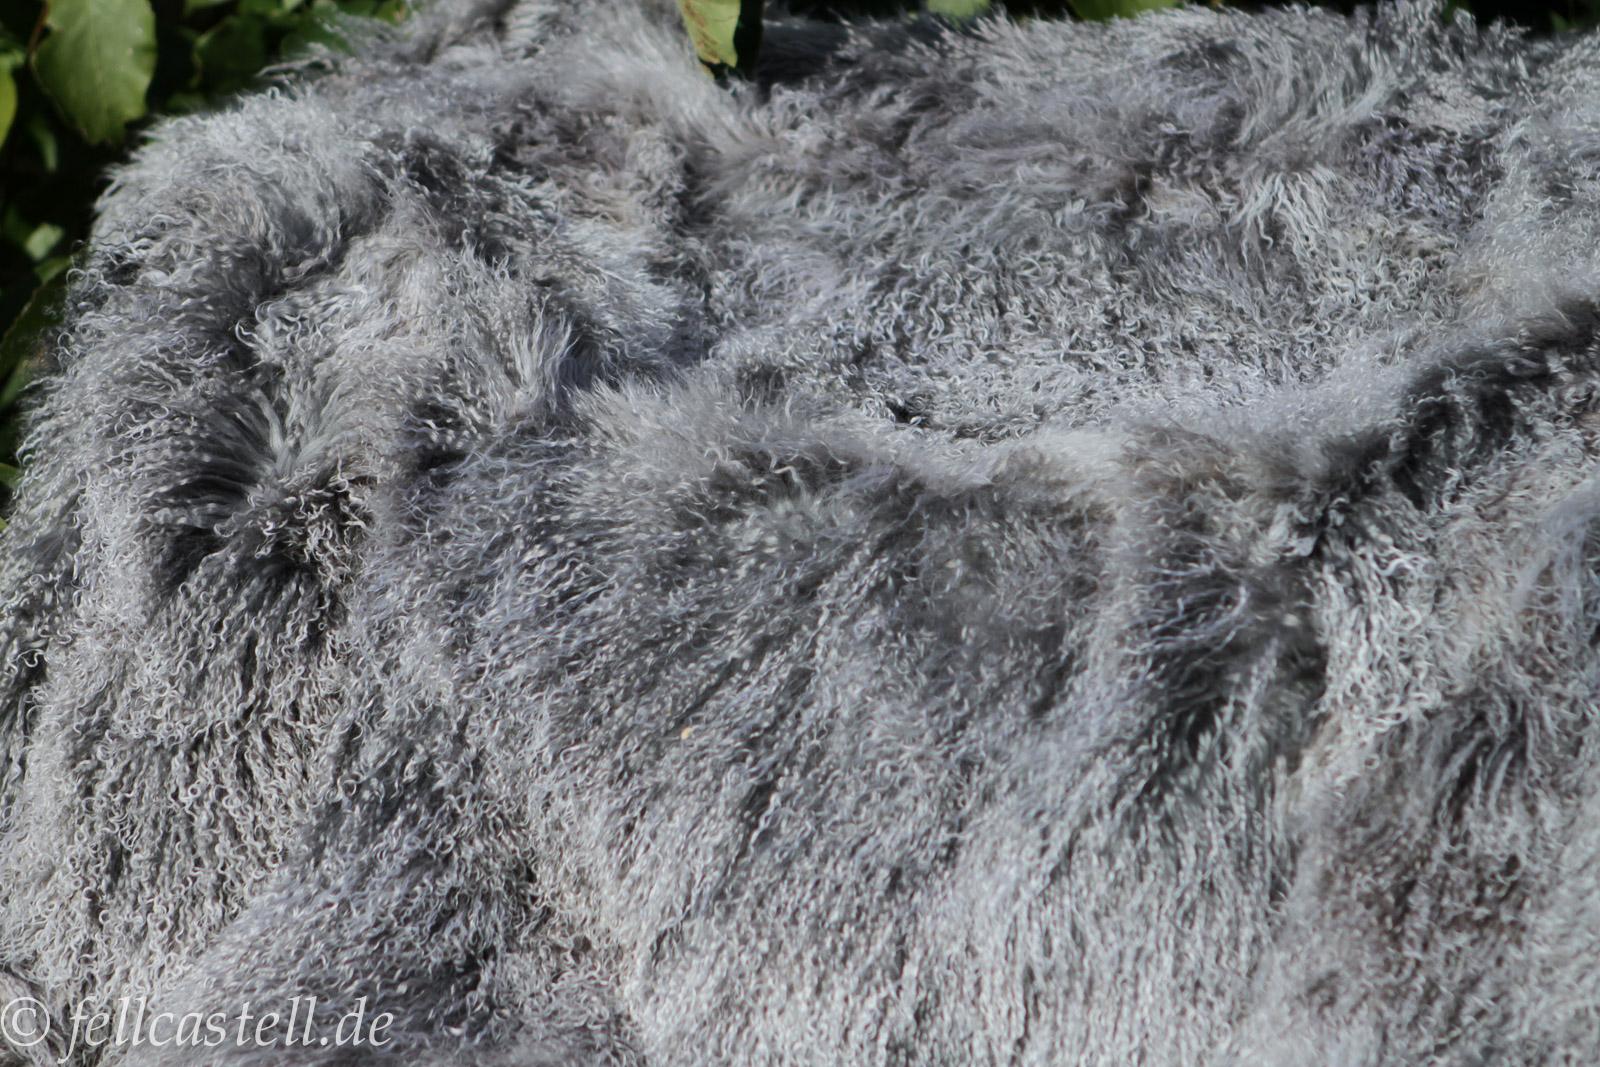 lammfelldecke tagesdecke tibet lammfell silbergrau 200 x 160 cm tibetlammfell lammfell. Black Bedroom Furniture Sets. Home Design Ideas